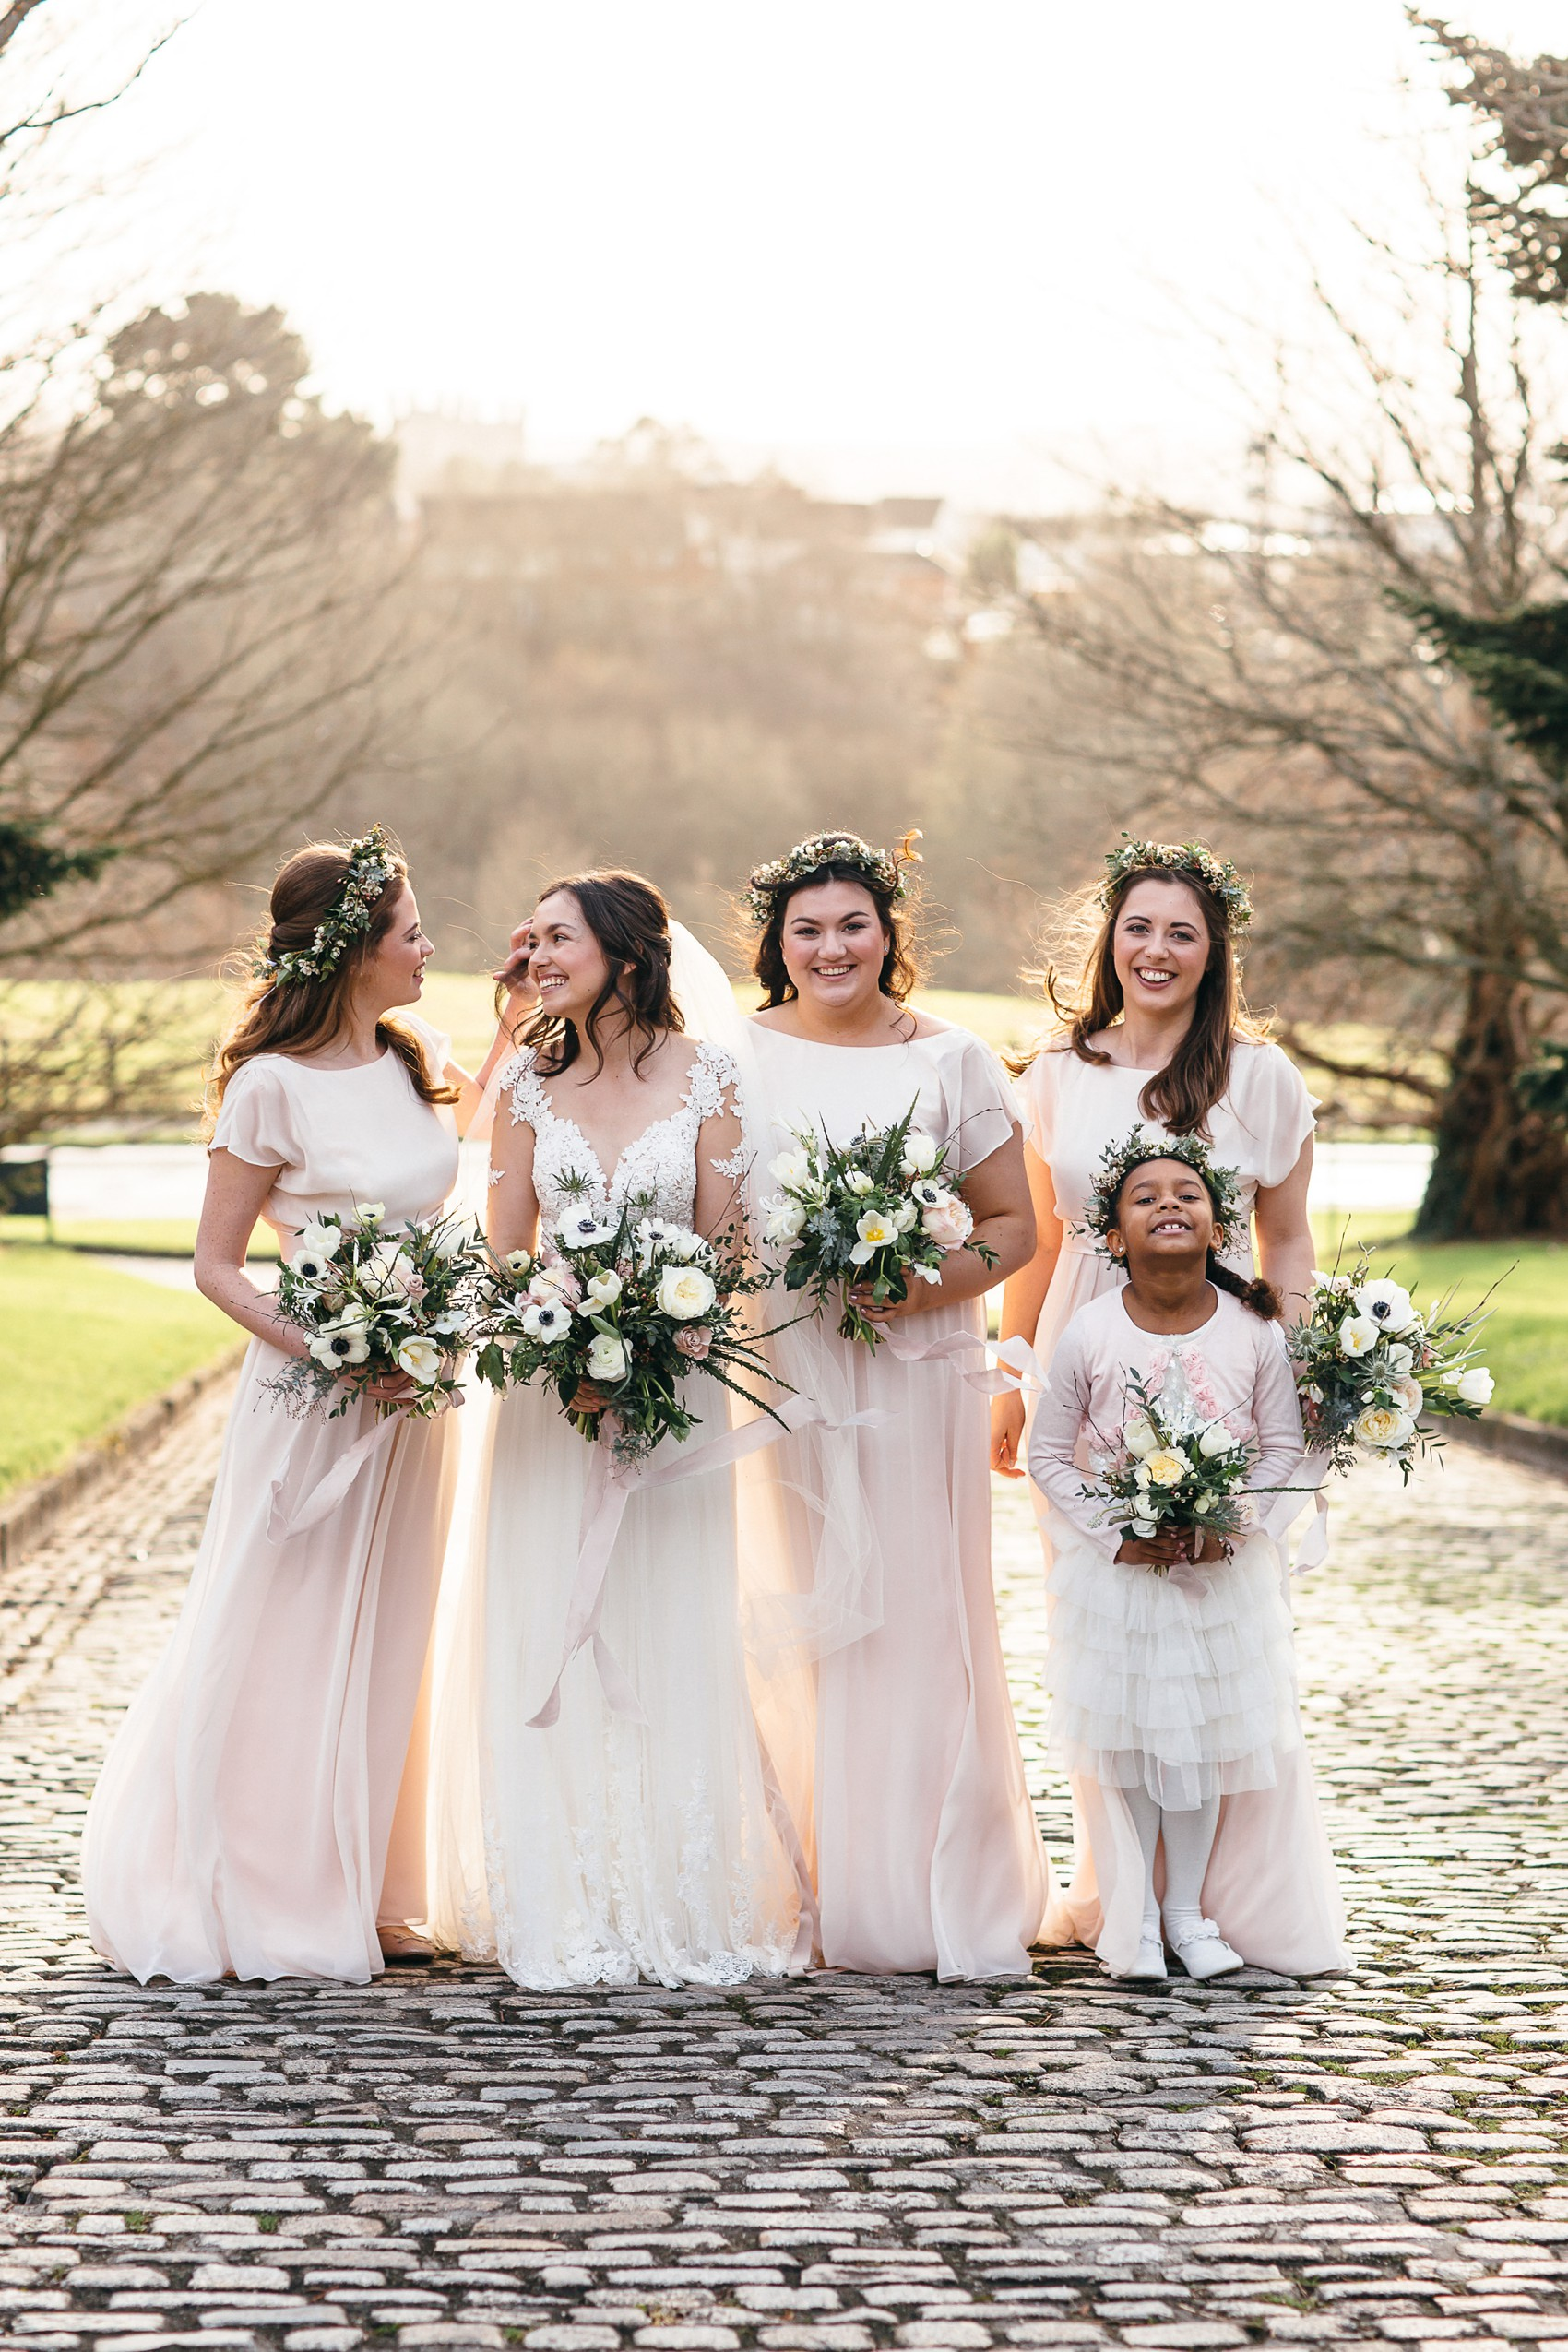 An Essense Of Australia Dress For An Elegant Festive Christmas Wedding Love My Dress Uk Wedding Blog Wedding Directory